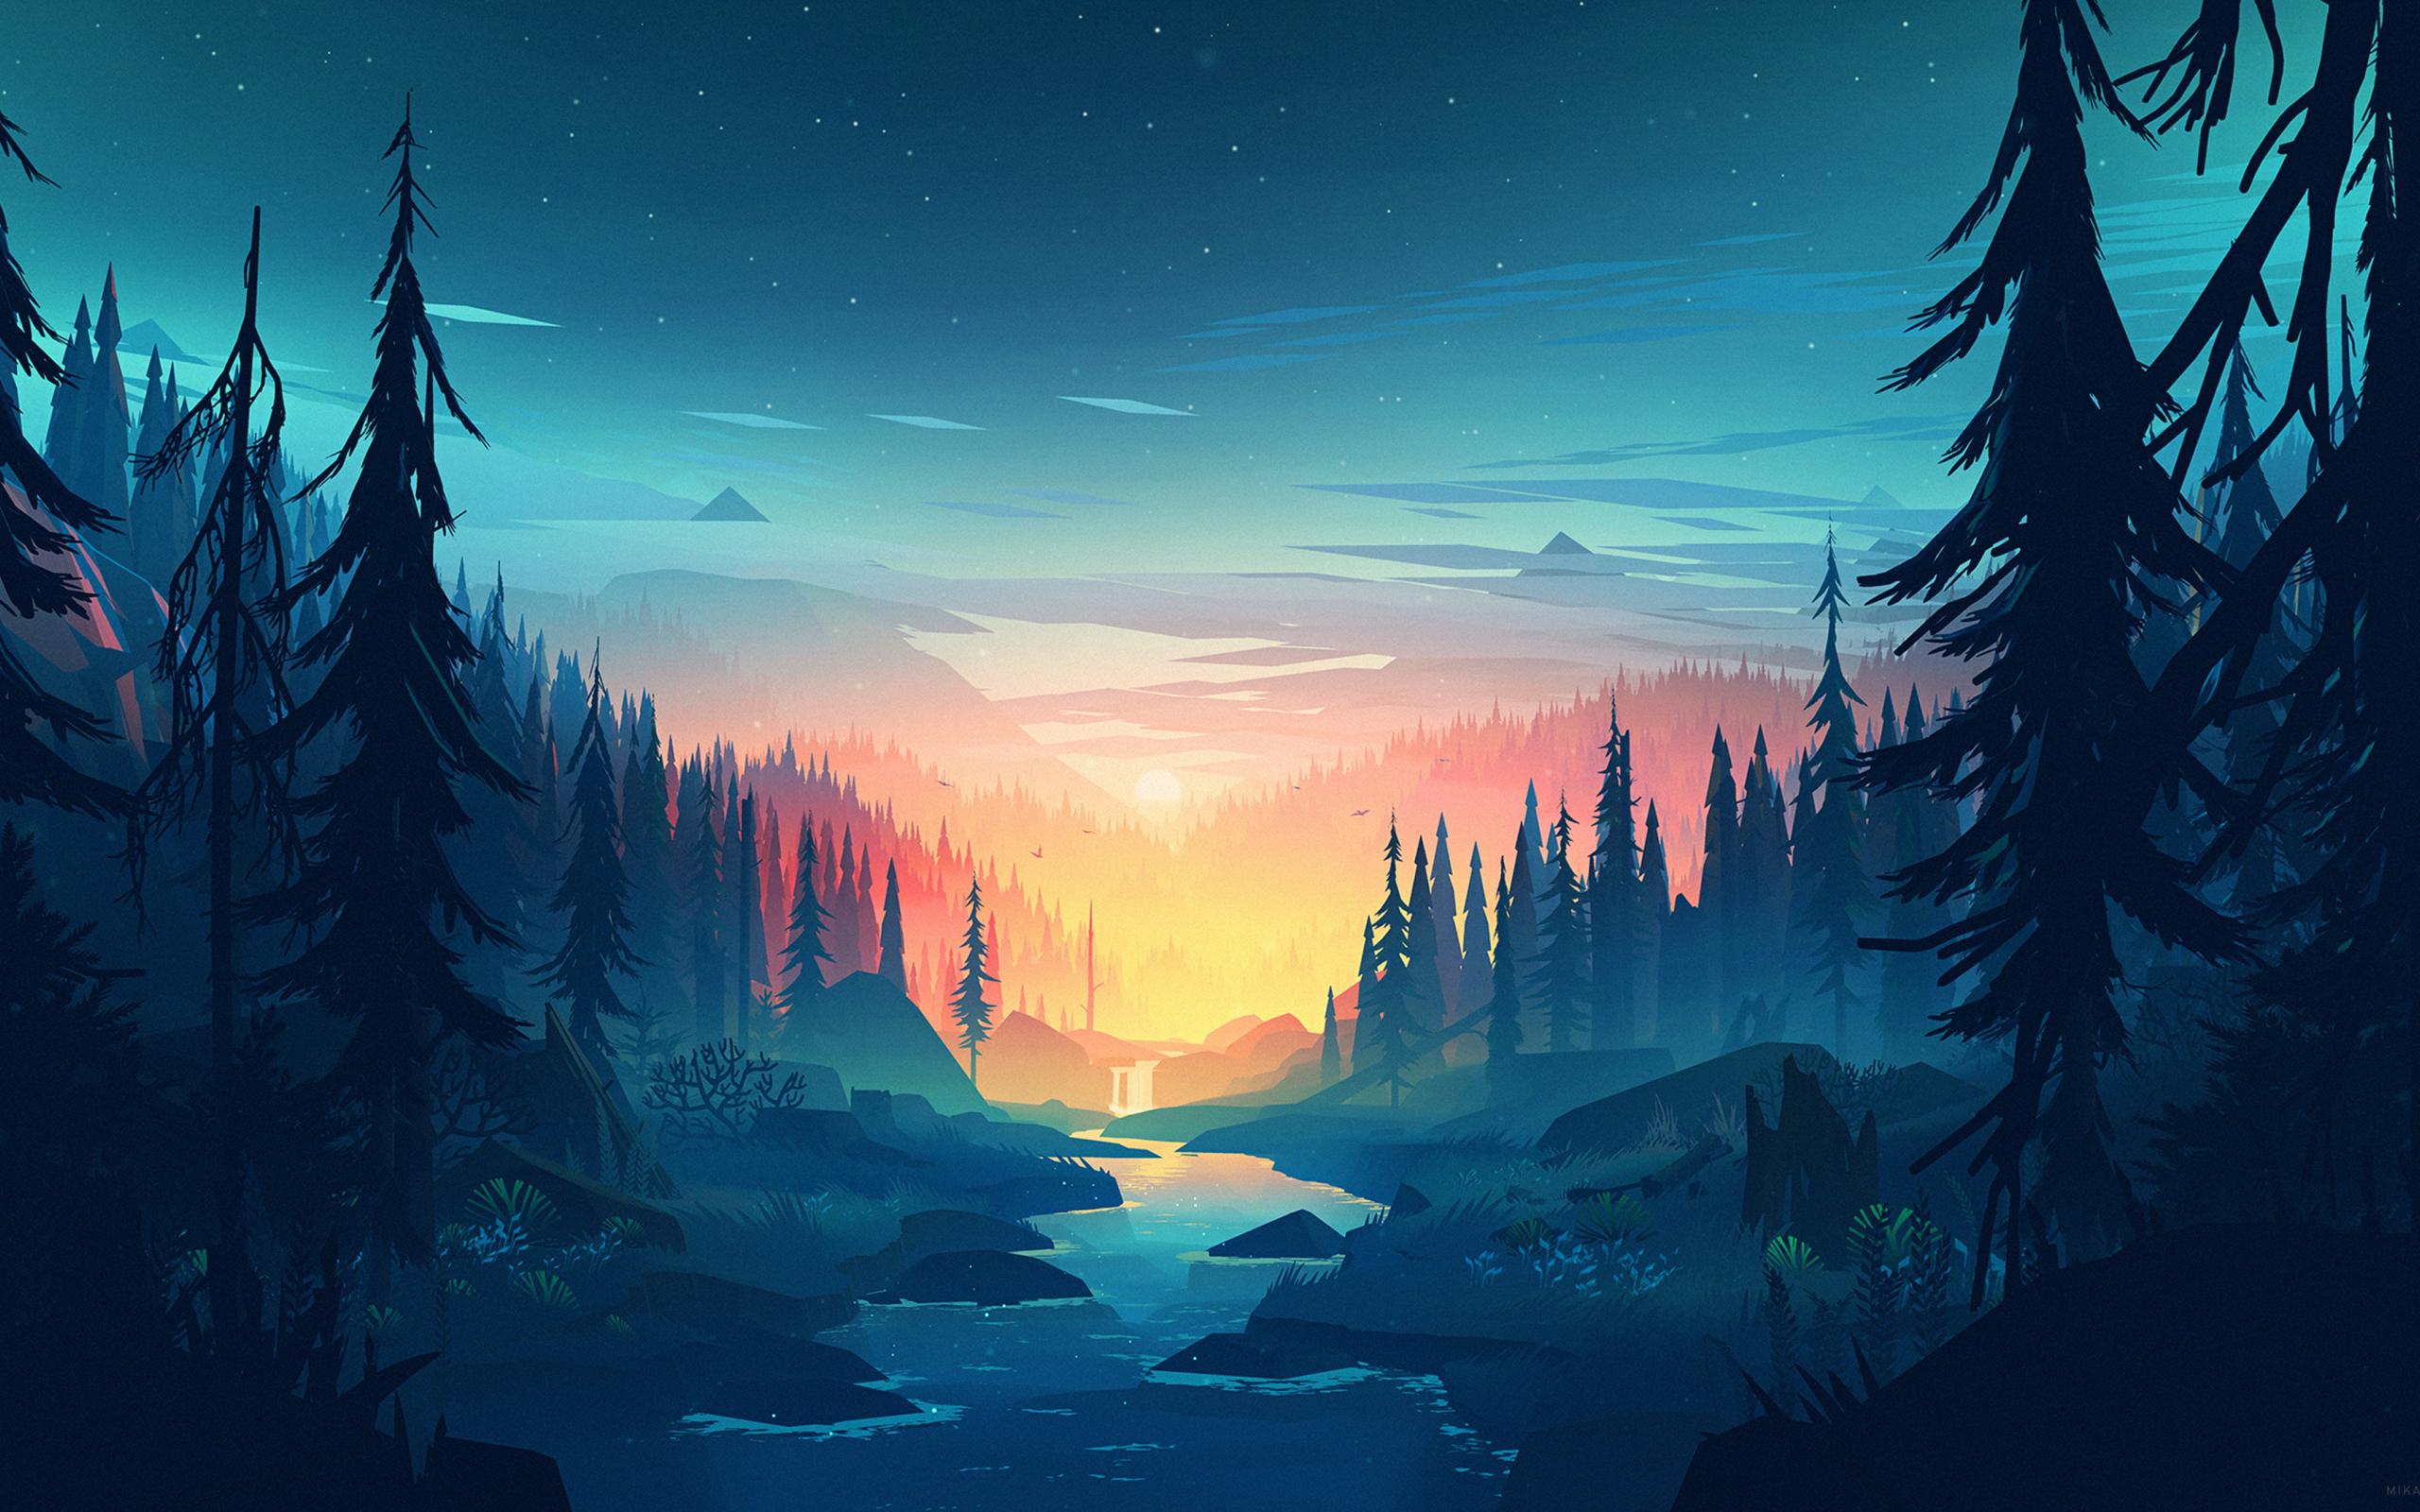 [48+] HD Nature Wallpapers 2560x1600 on WallpaperSafari